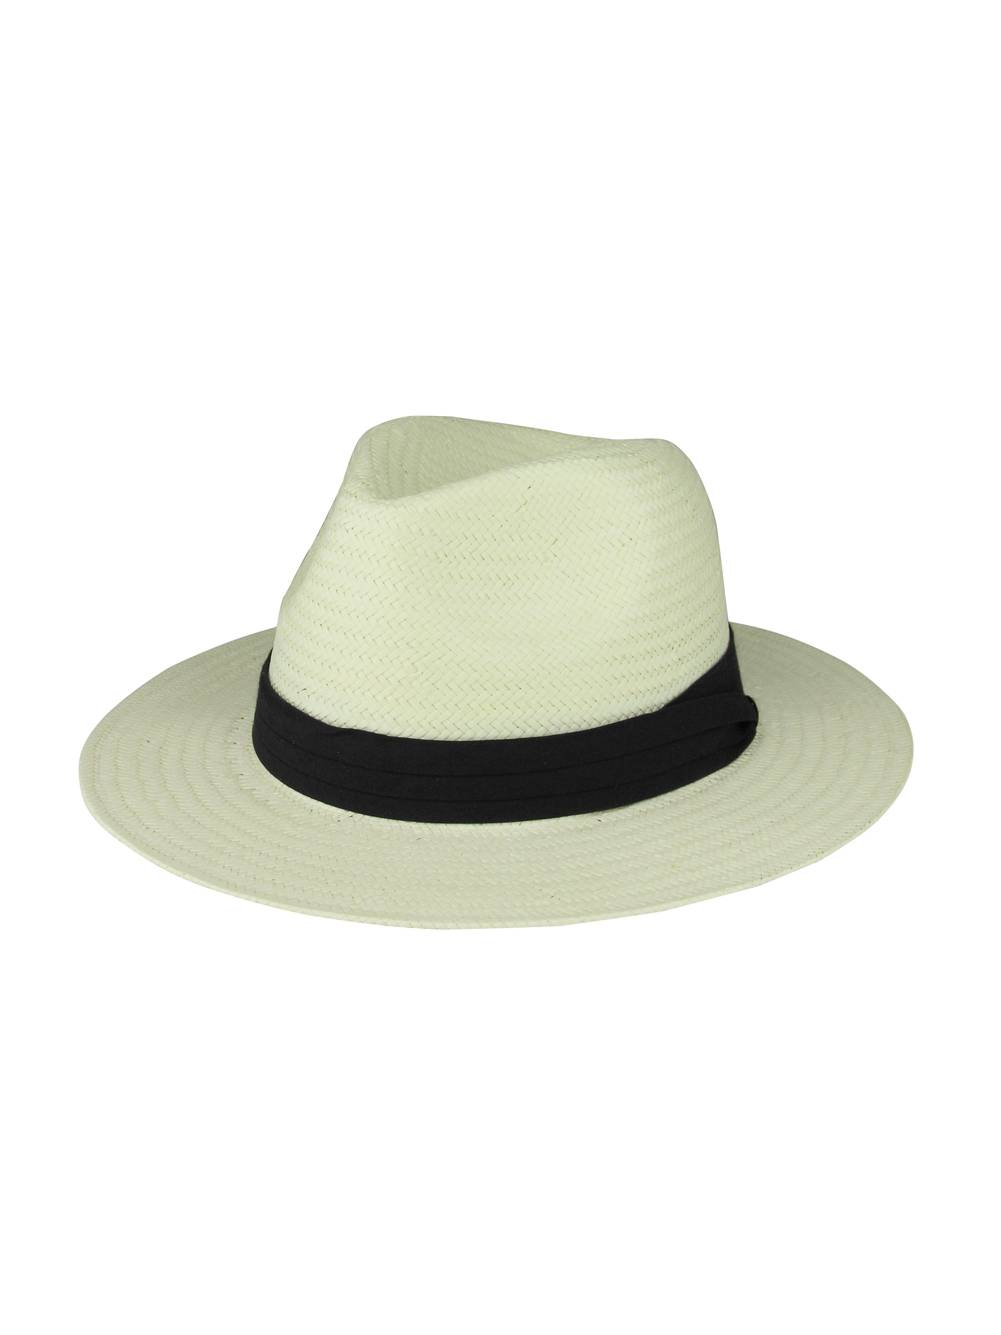 Toyo Paper Straw Fedora Hat - Cream Denim afc736e29bac